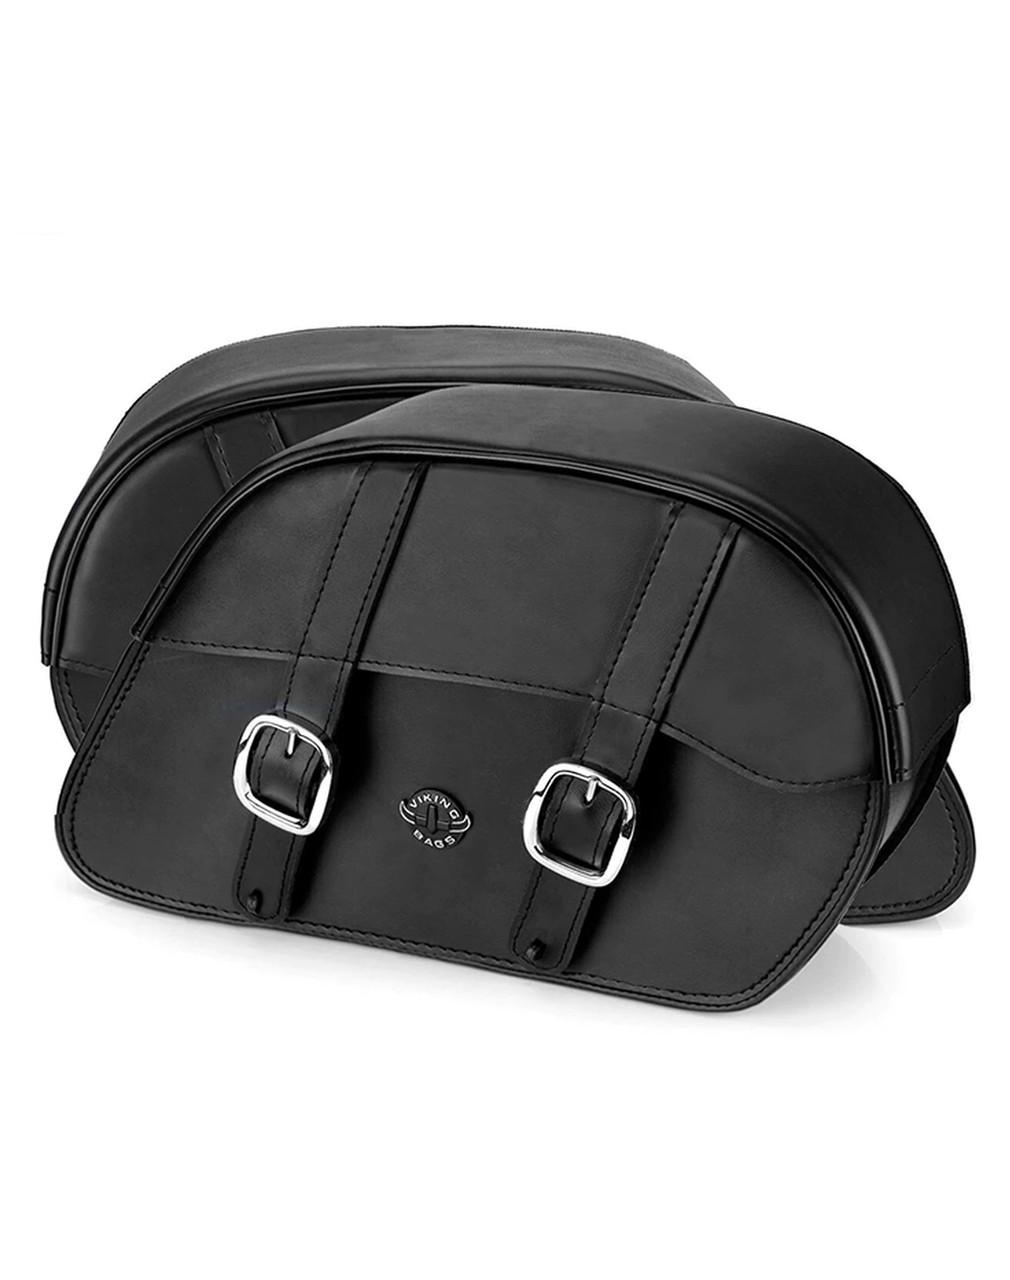 Honda 1500 Valkyrie Interstate Slanted Large Motorcycle Saddlebags Both Bags View